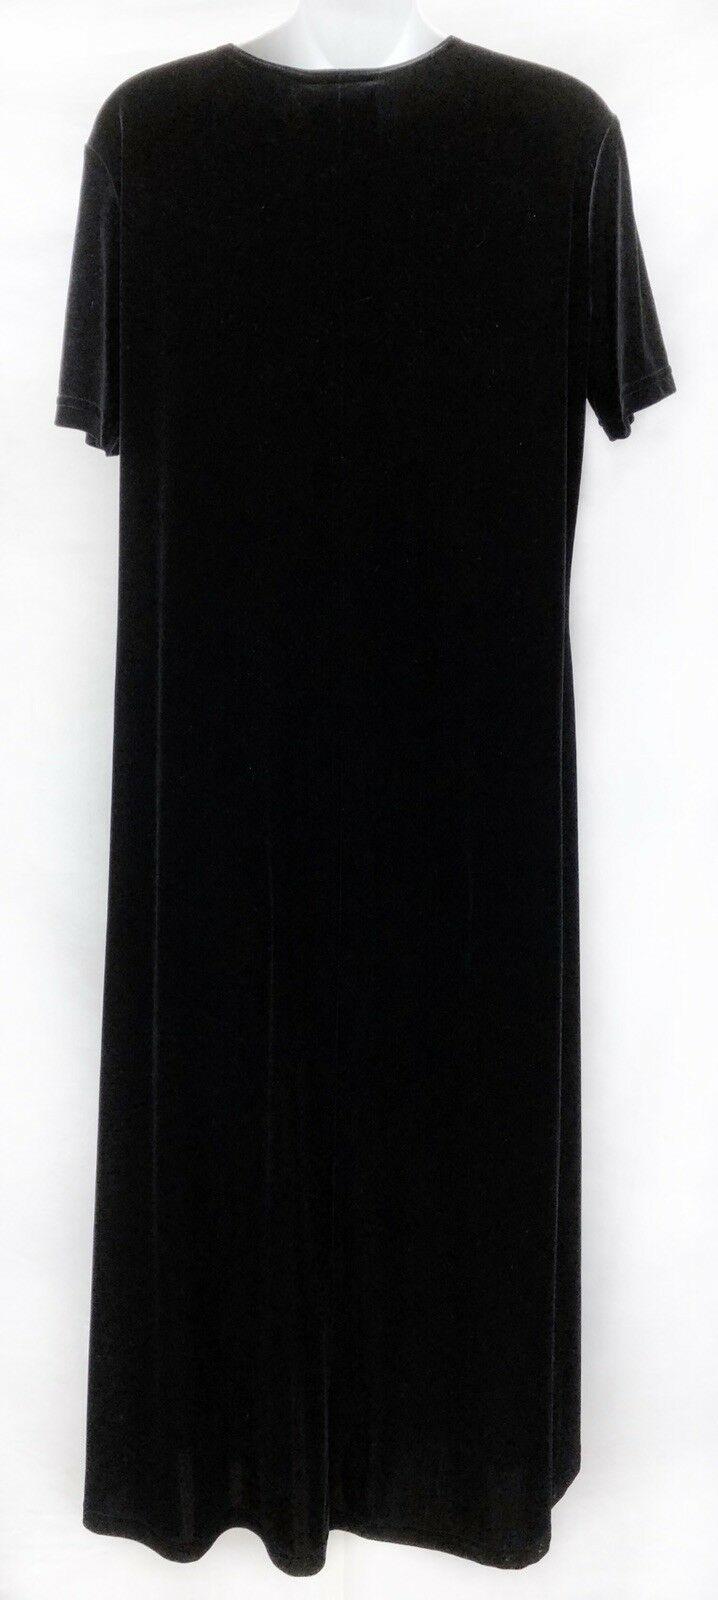 Sz L Classy Black Stretch Lux Velvet Maxi Dress Short Sleeve Womens Dress USA